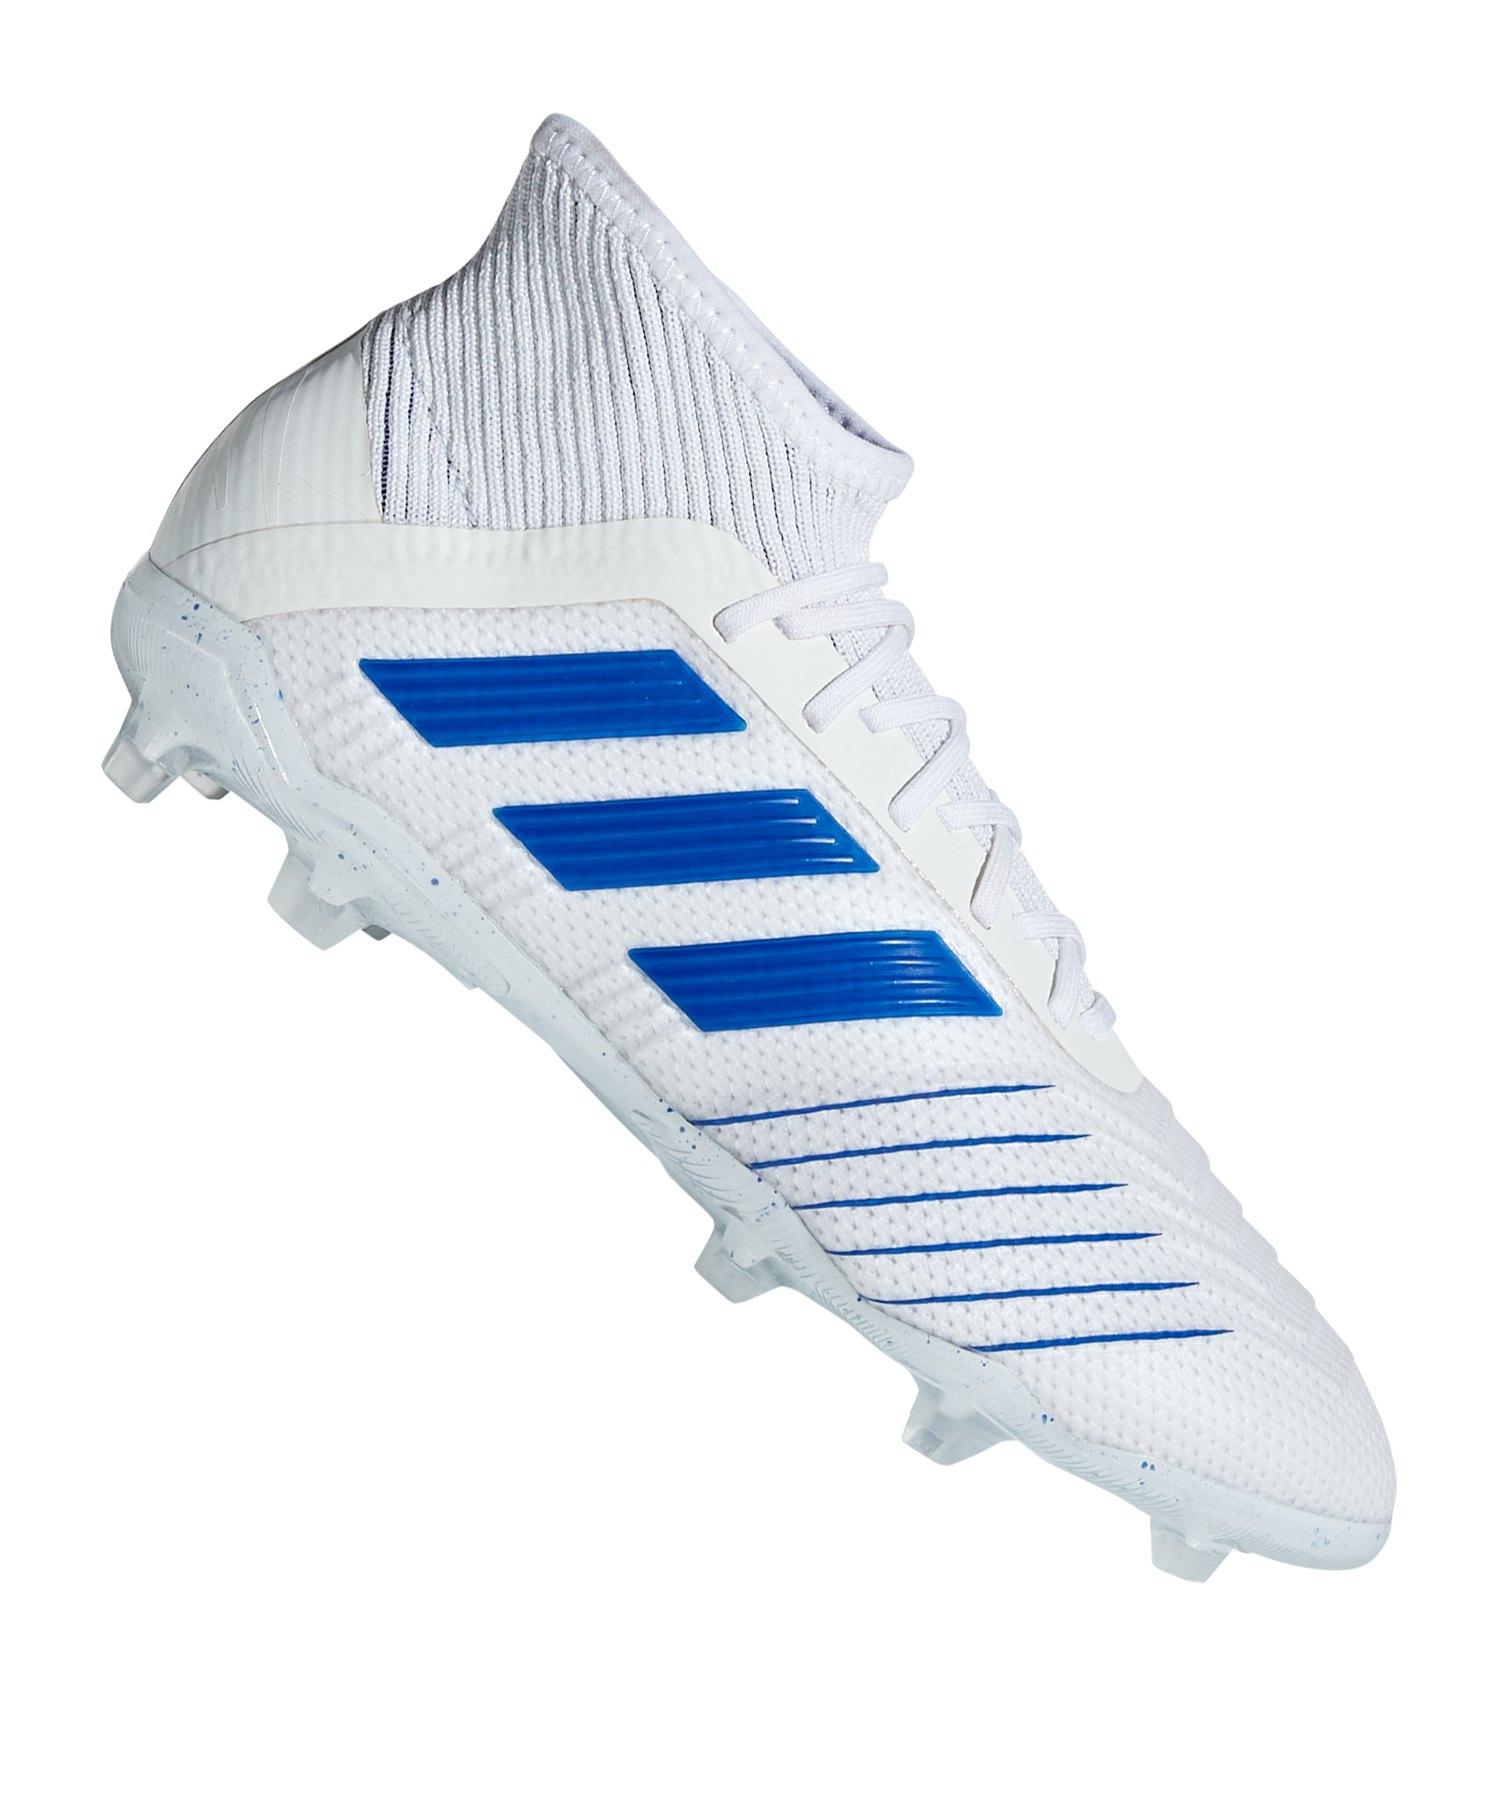 adidas Predator 19.1 FG J Kids Weiss Blau - weiss